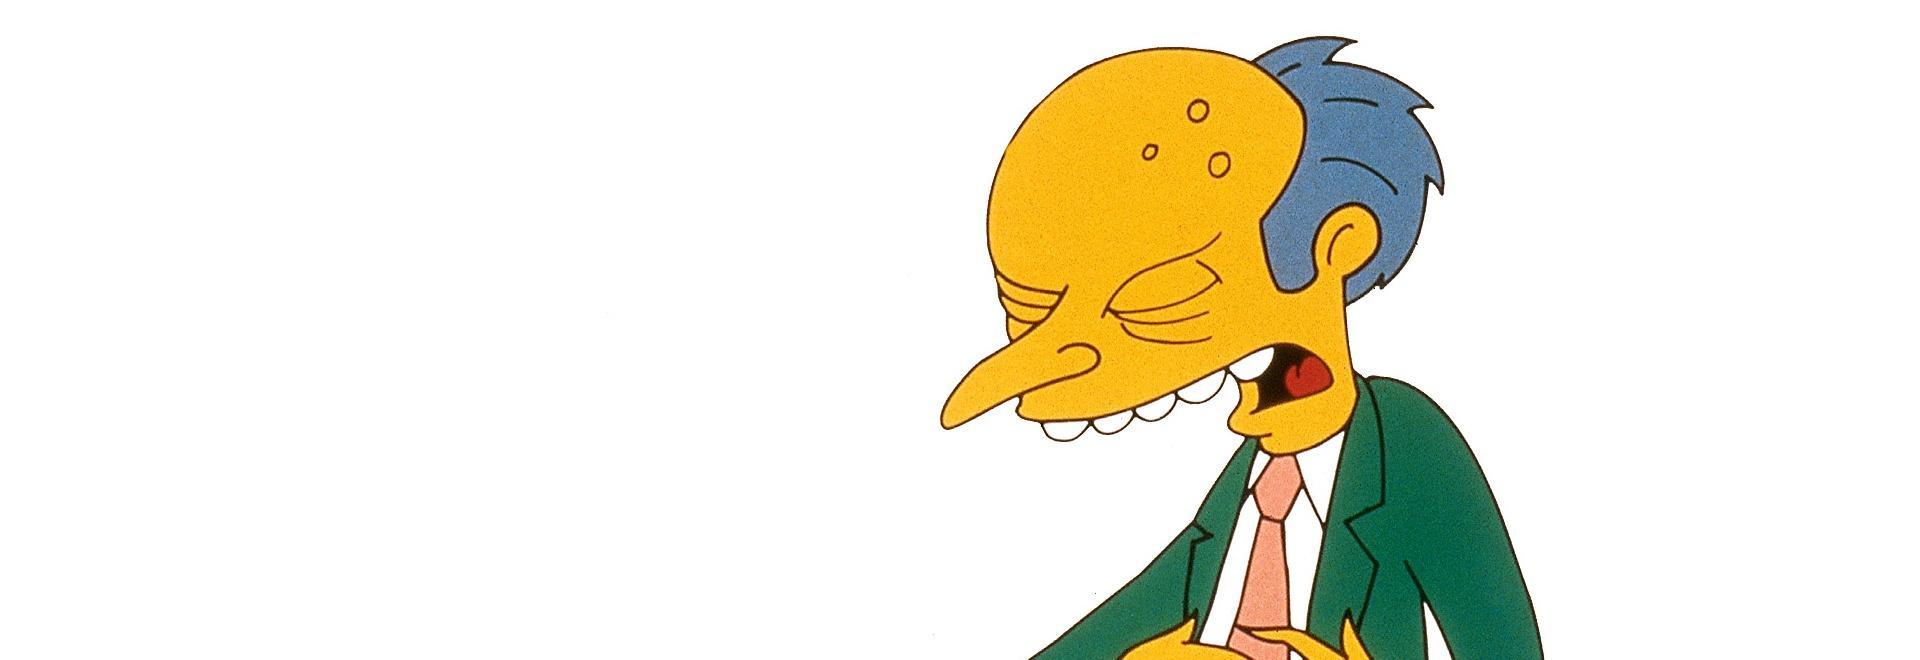 Springfield Files